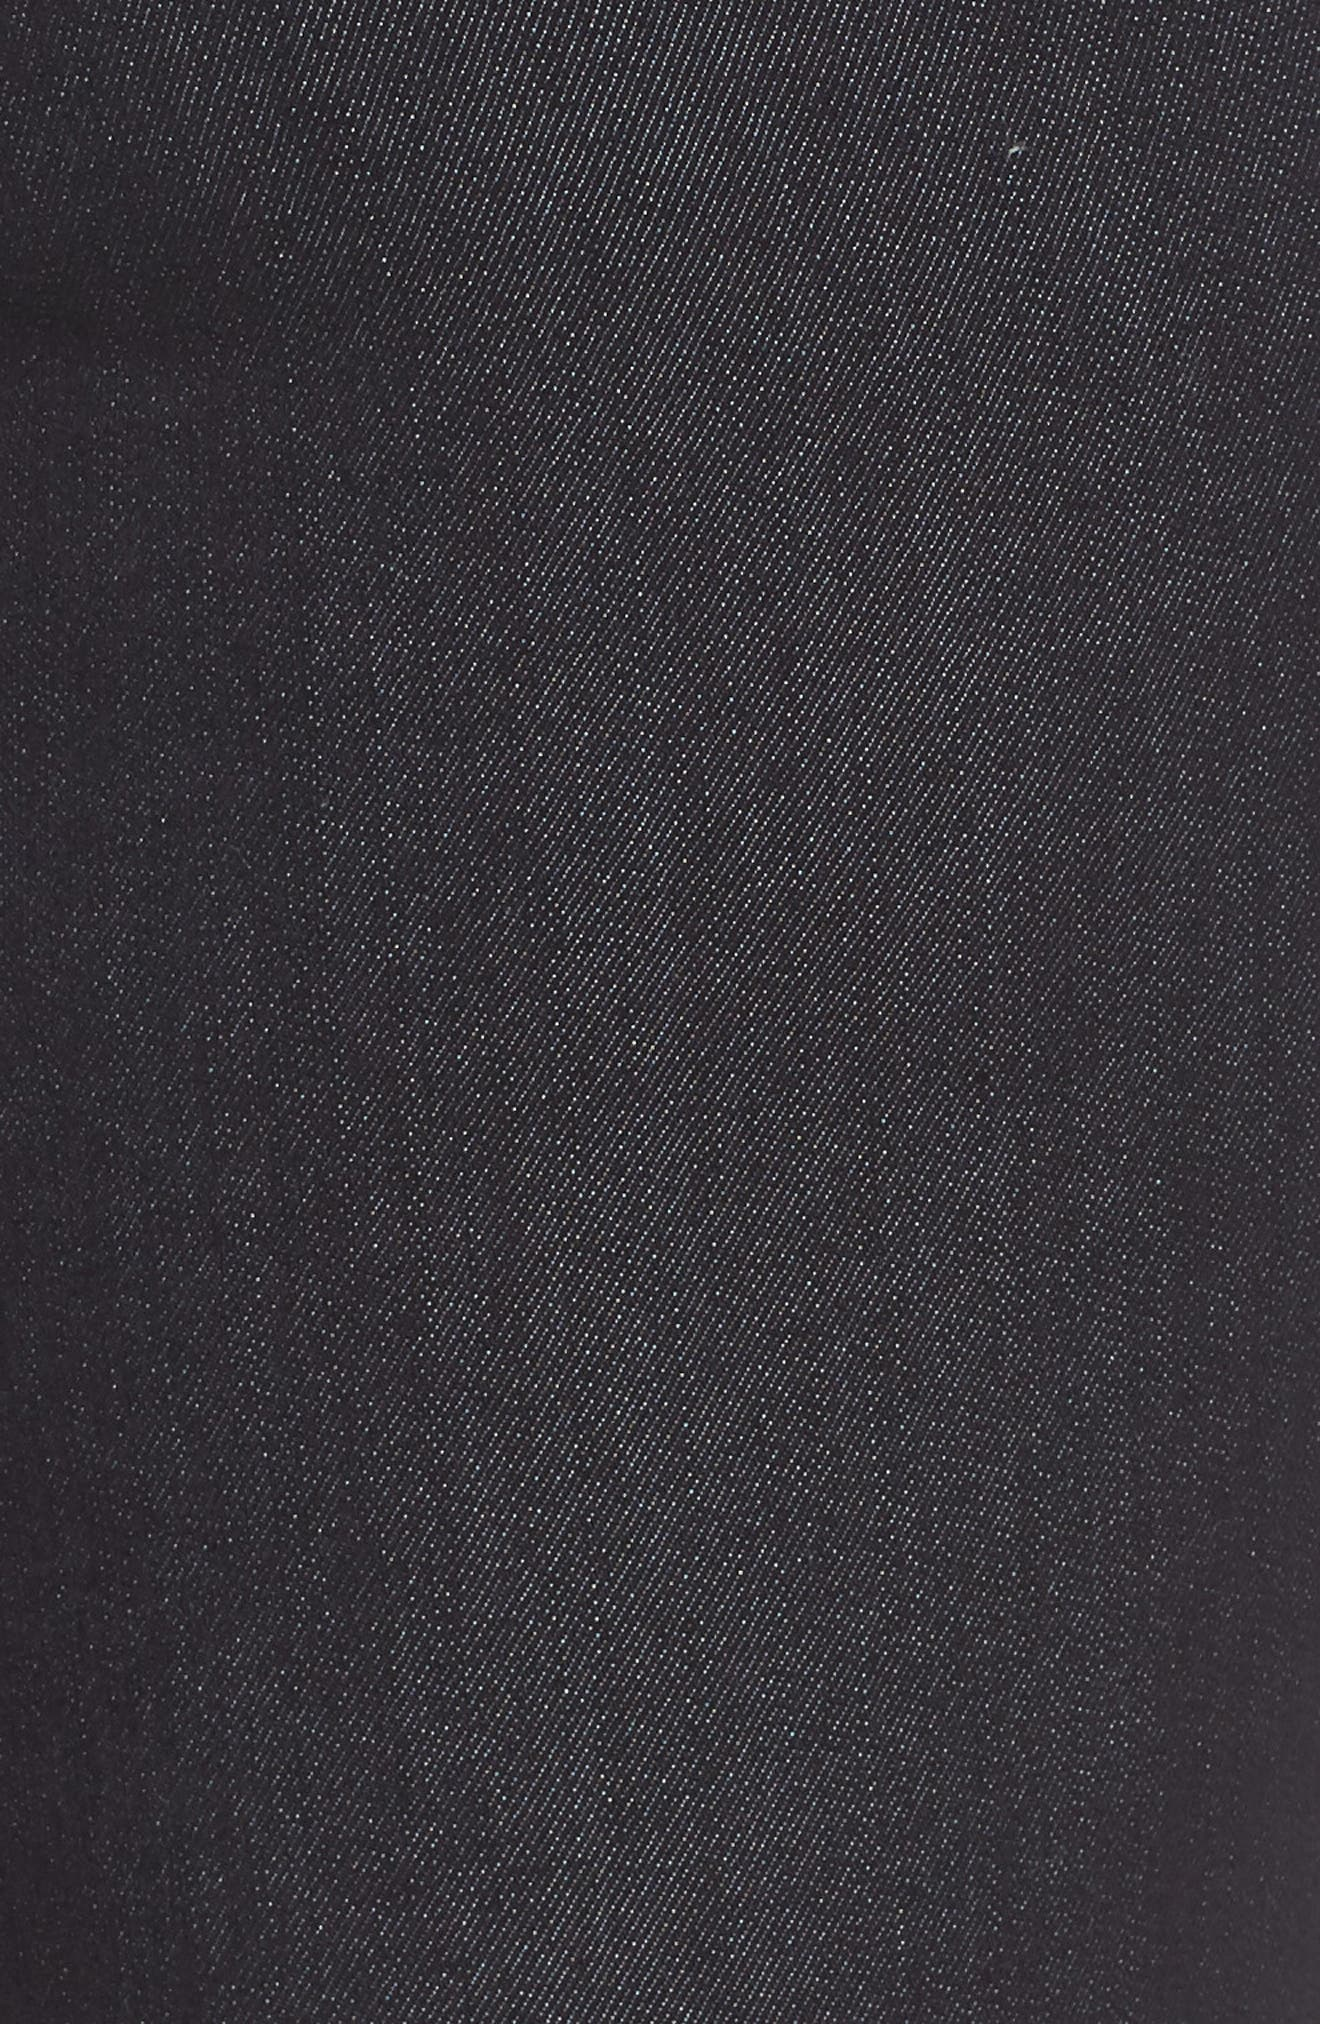 30/11 Ab-solution High Waist Skinny Jeans,                             Alternate thumbnail 5, color,                             INDIGO